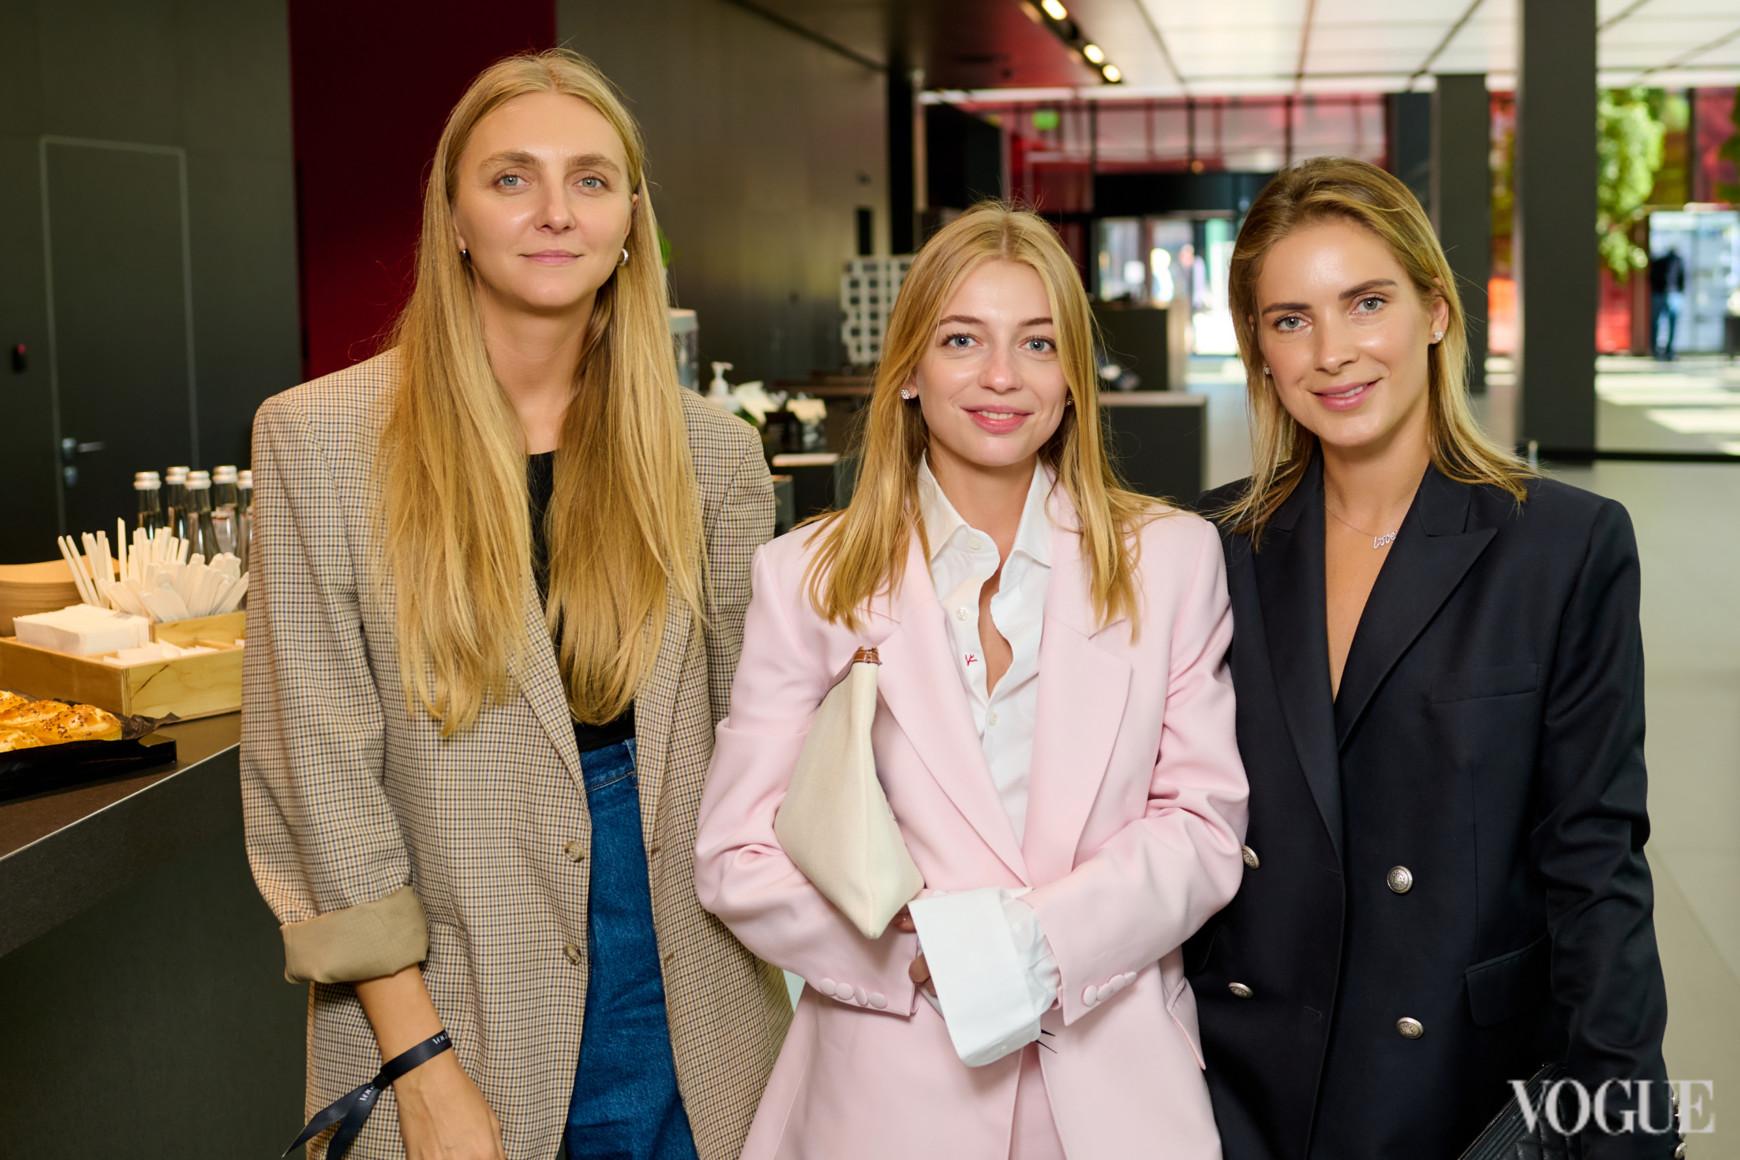 Ксения Шнайдер, Катерина Рыжова и Алина Долинина